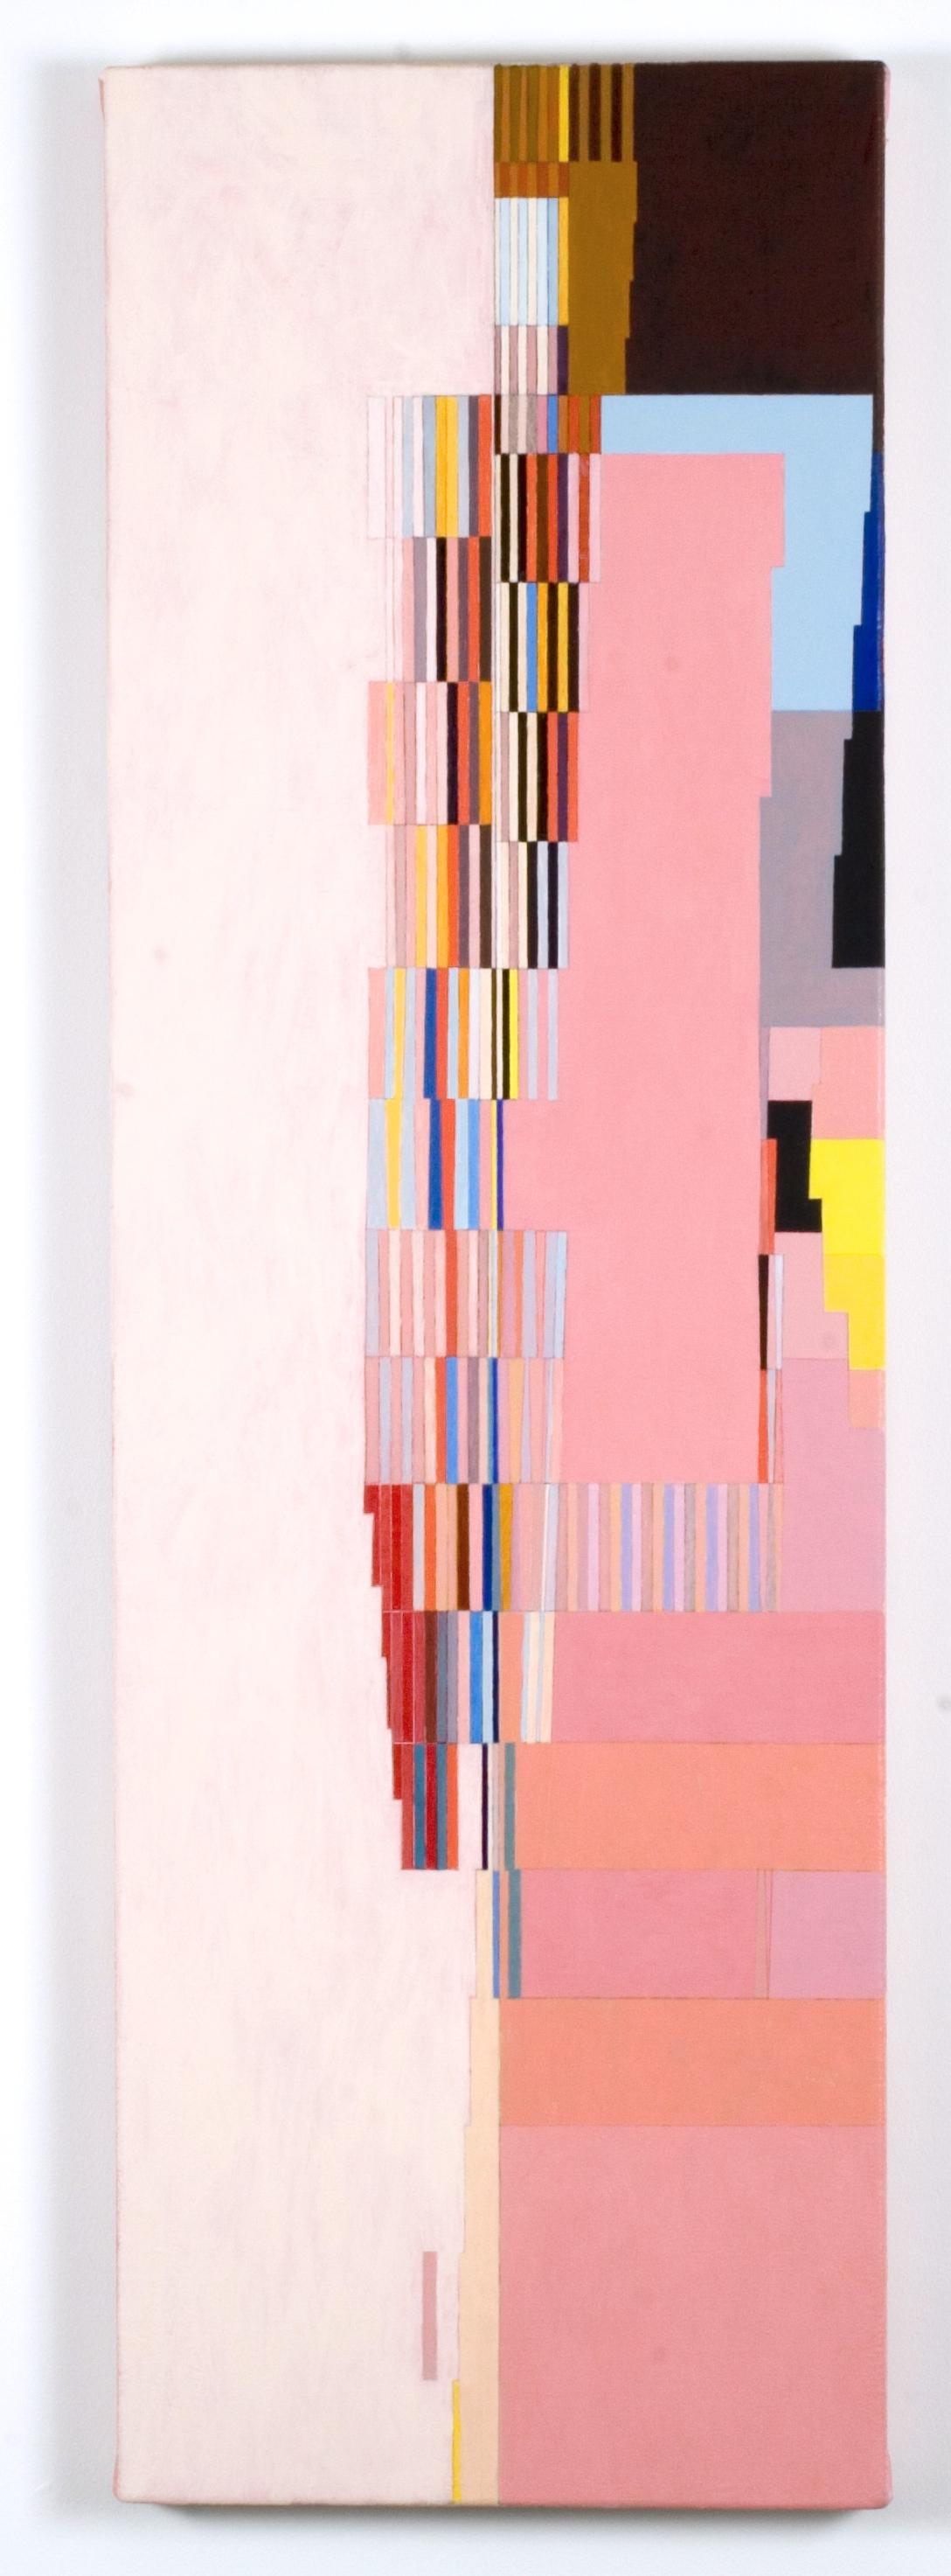 "Embu, 2005, gouache on paper, 42 3/4""x13 1/2"""